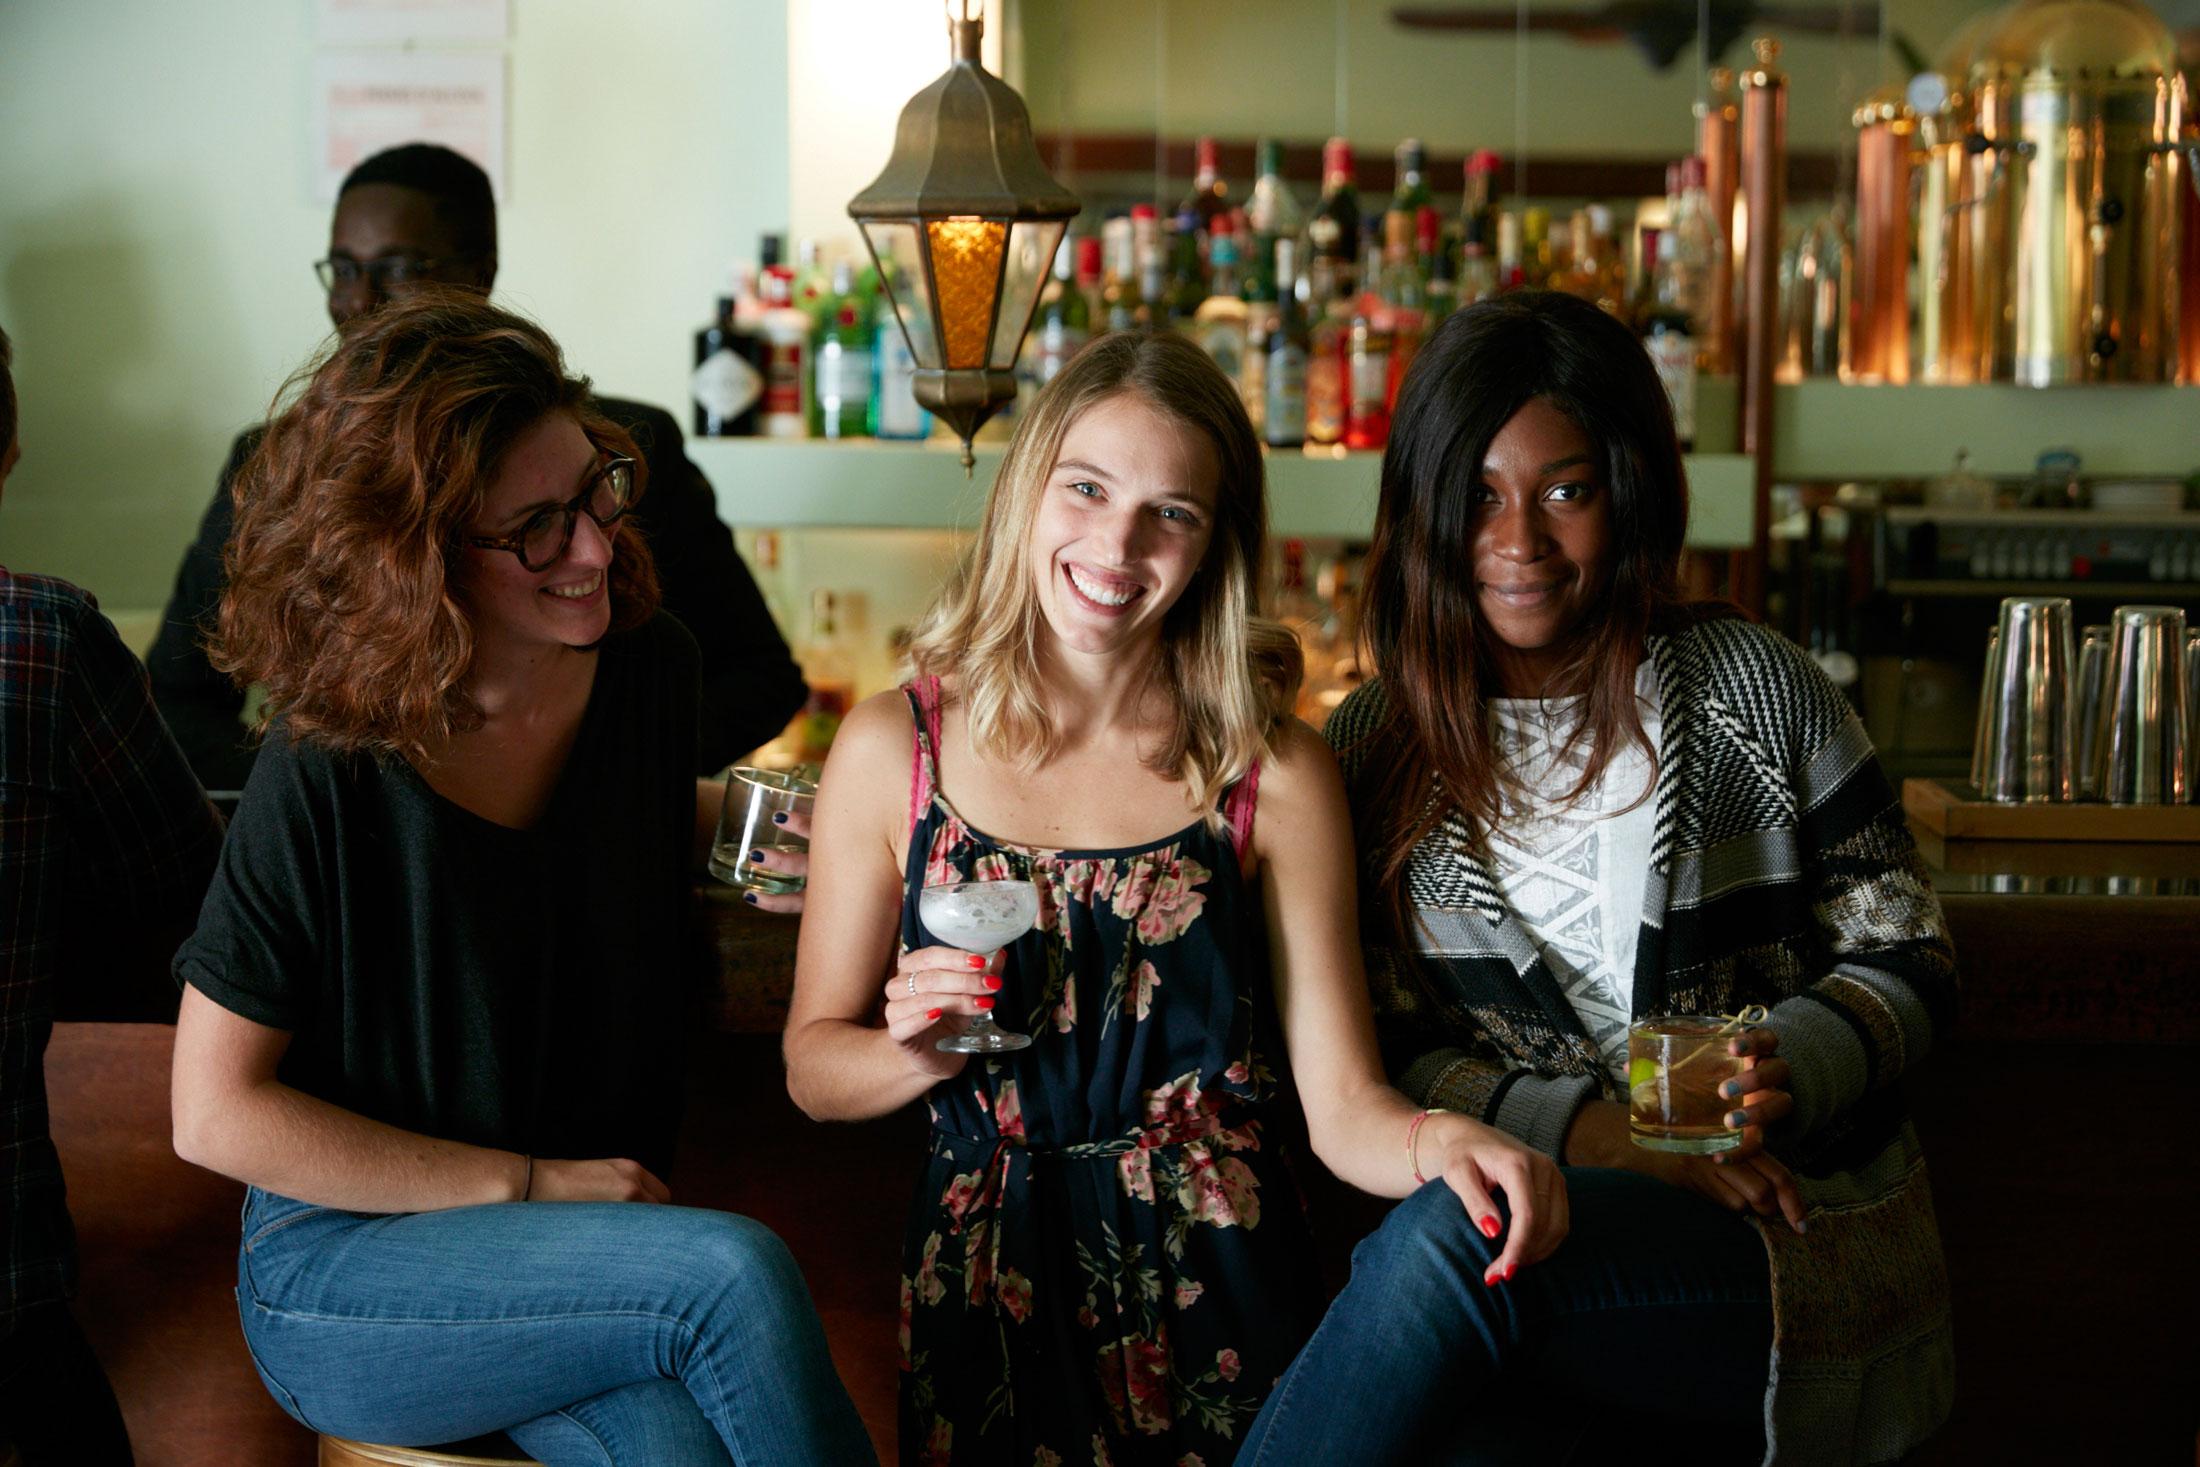 Melissa, Lola, & Laetitia